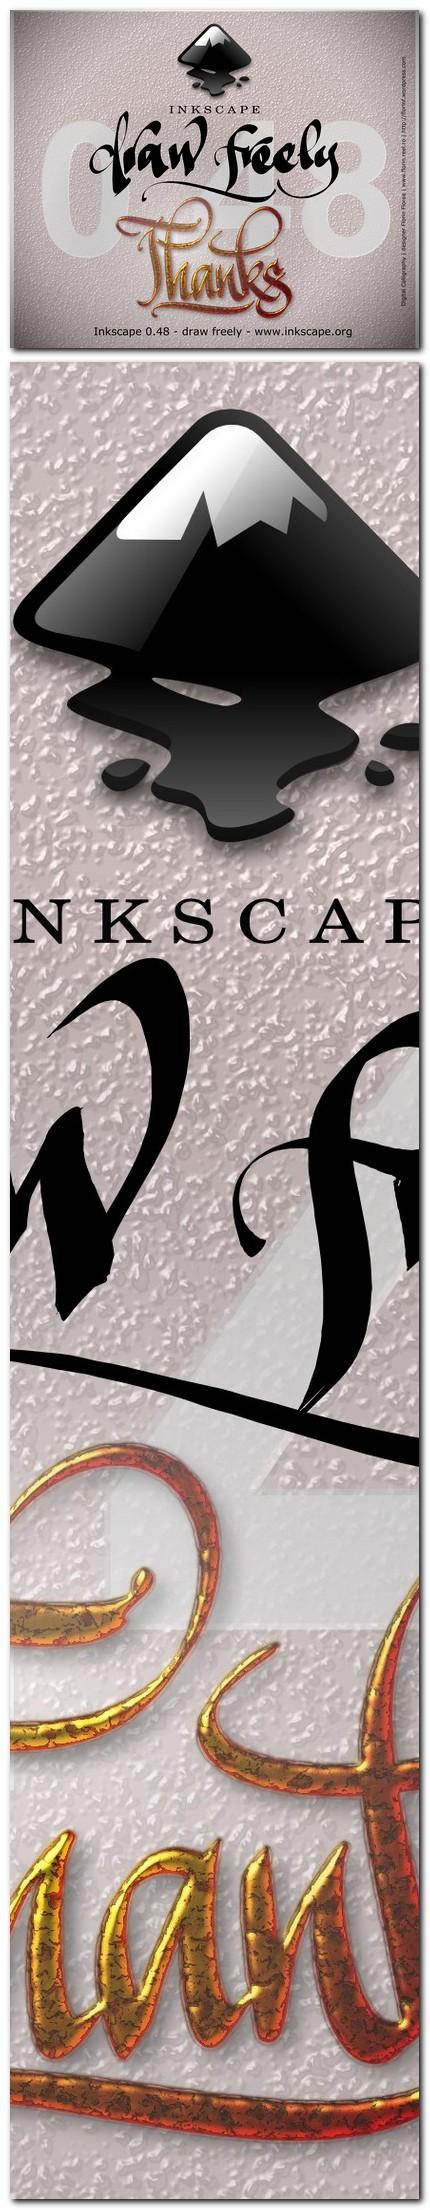 "07 ecran ""About Inkscape"" varianta netrimisa - florinf"